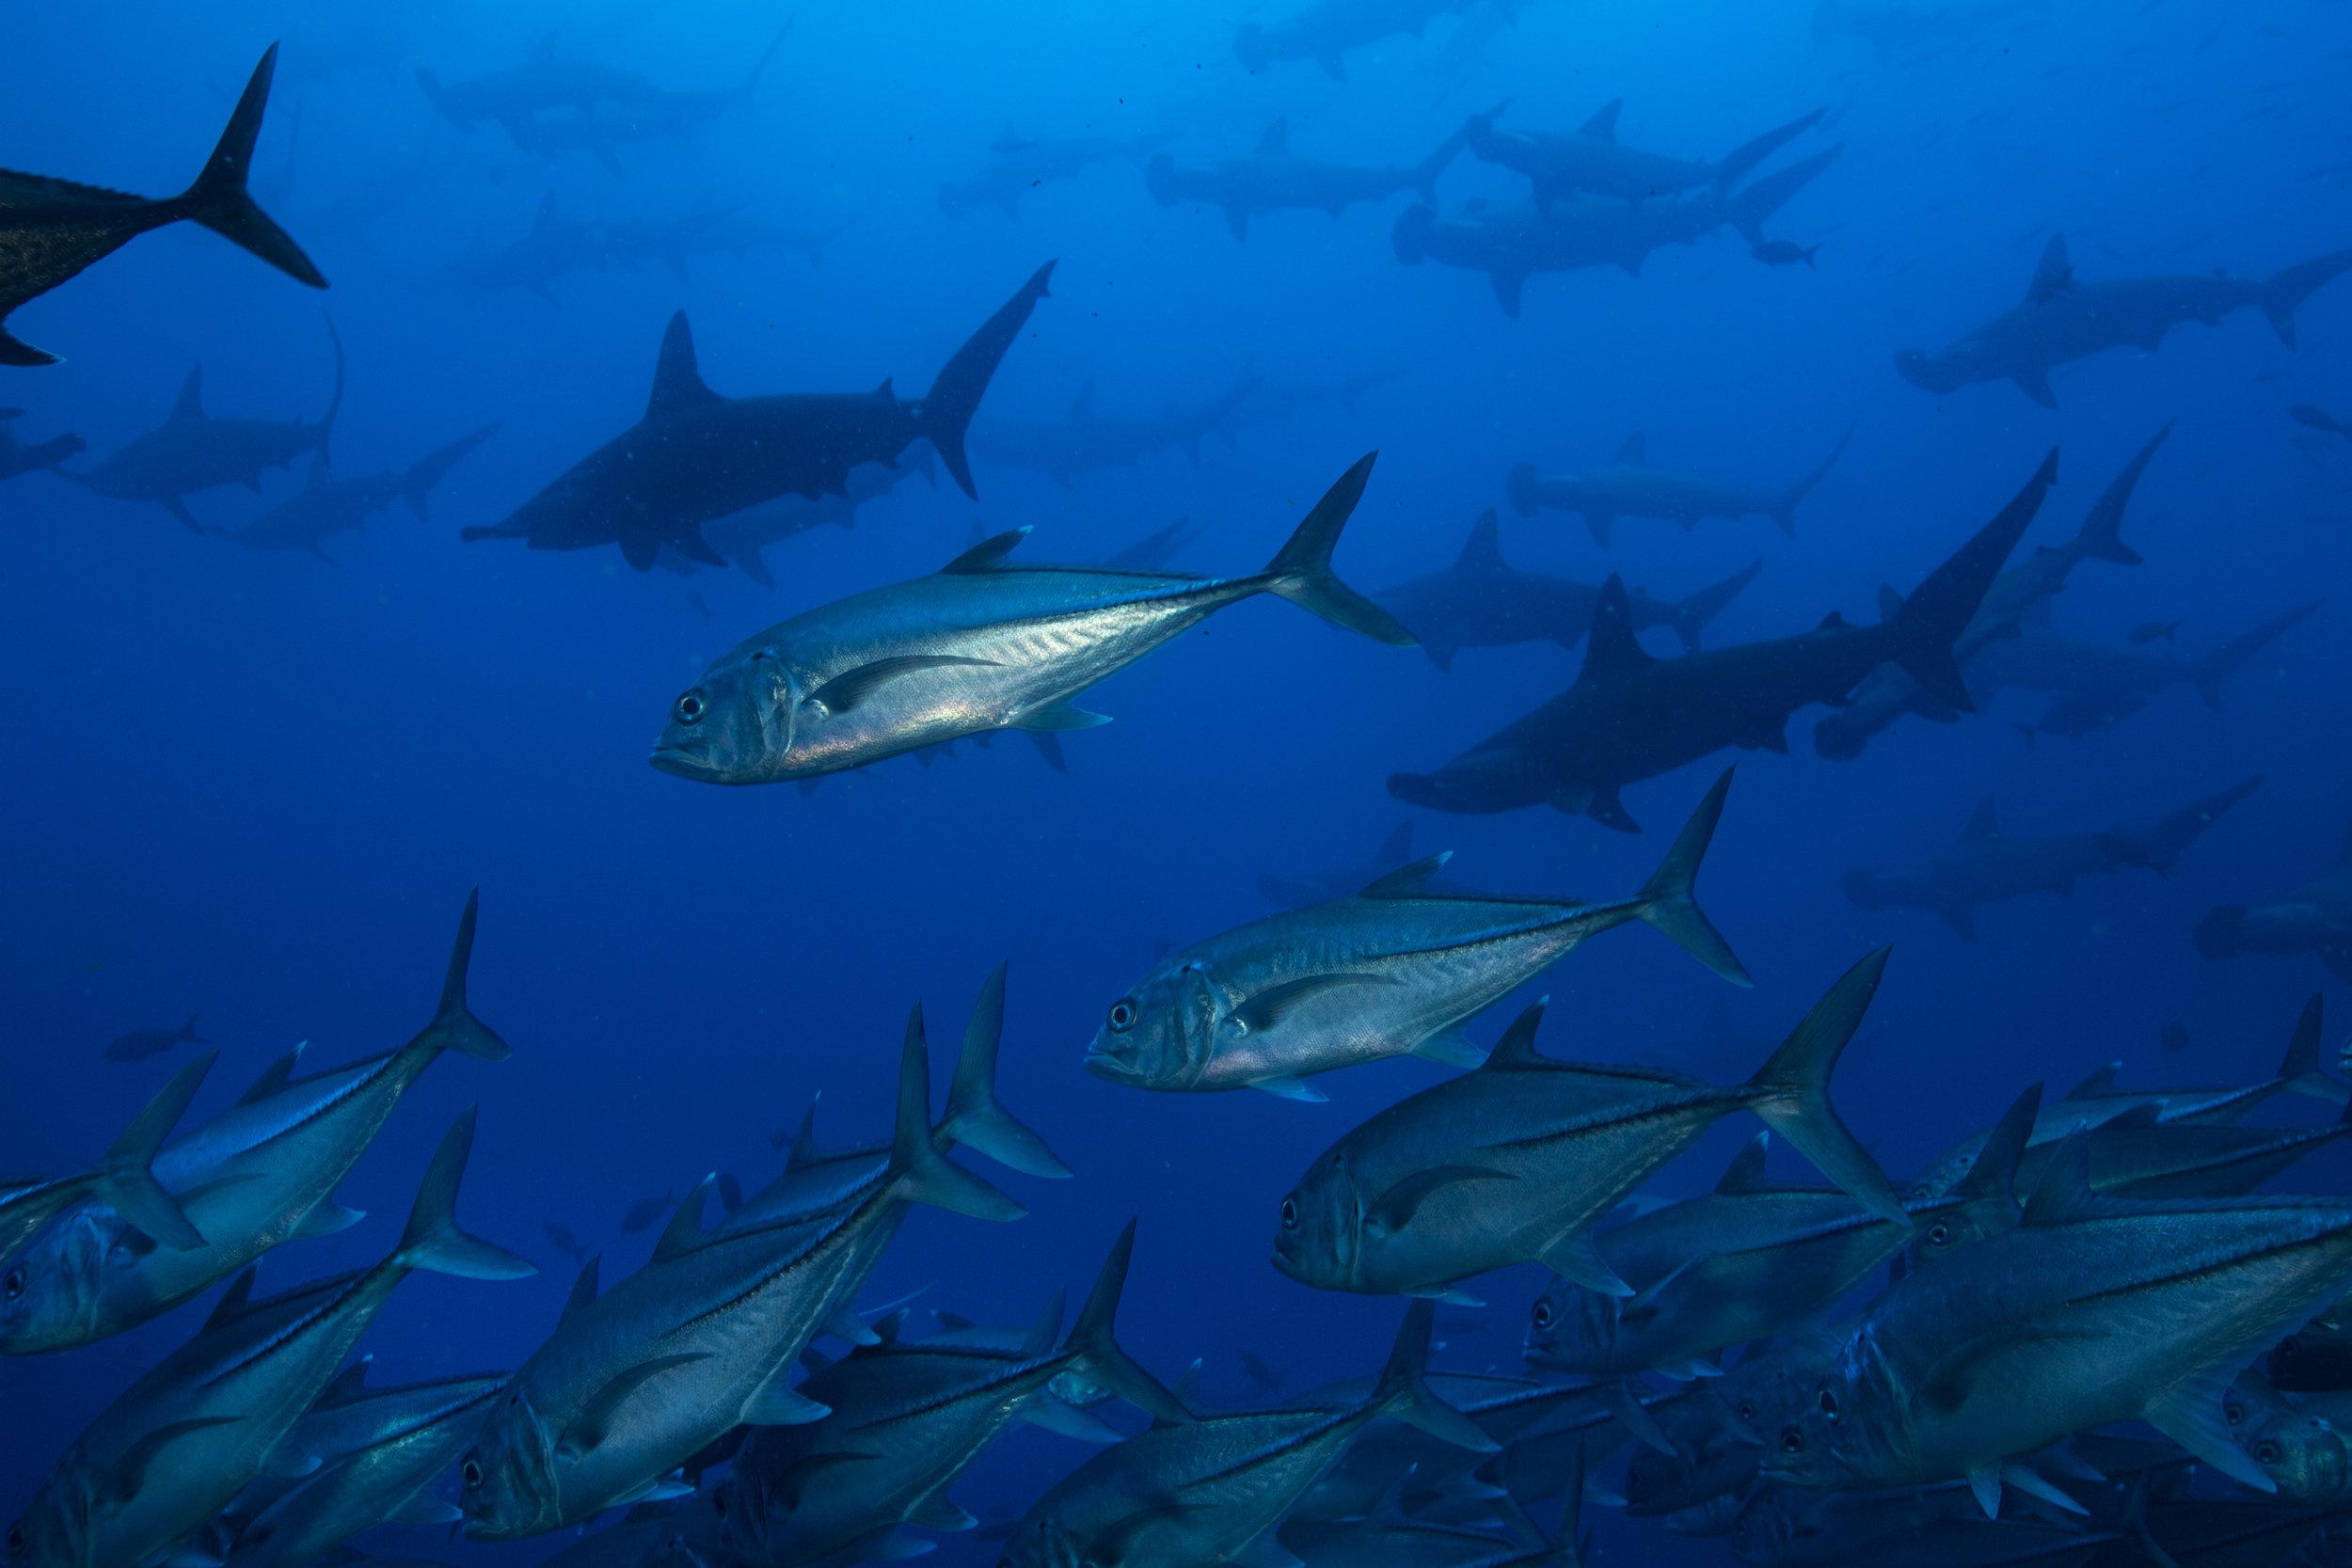 JACK AND SHARKS CREDIT: RICK MISKIV / coral reef image bank